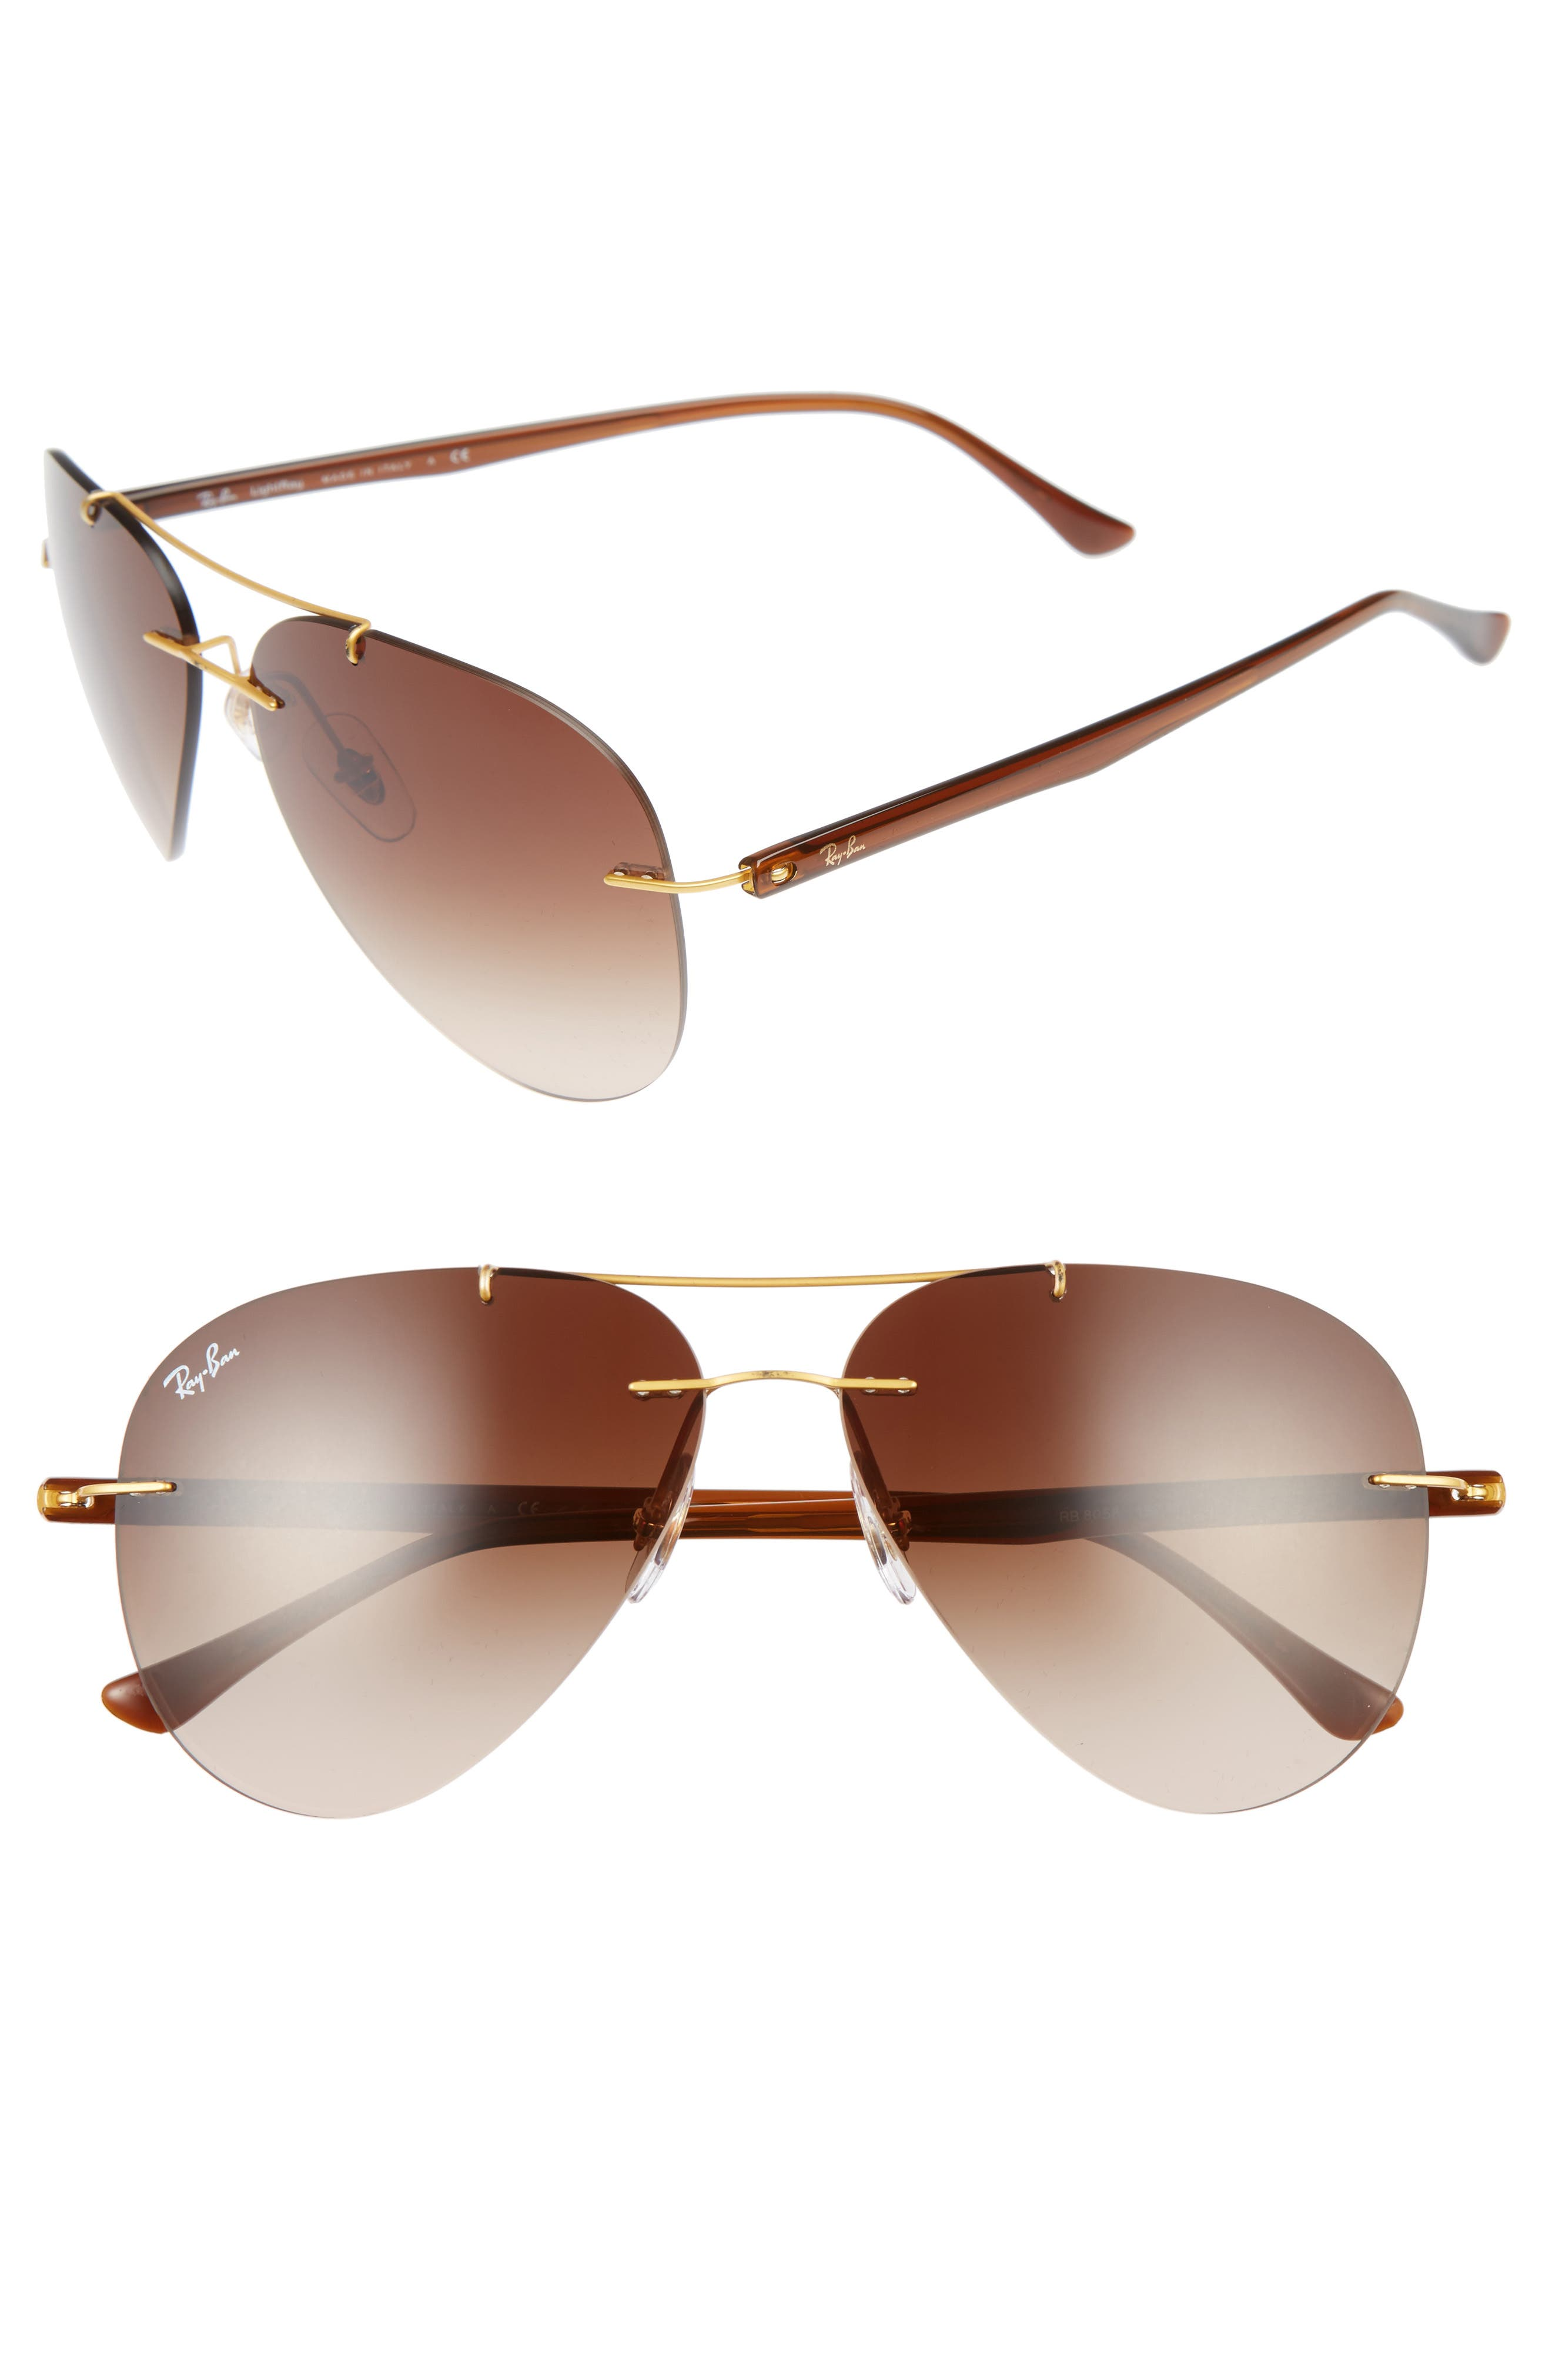 Main Image - Ray-Ban Tech 59mm Aviator Sunglasses